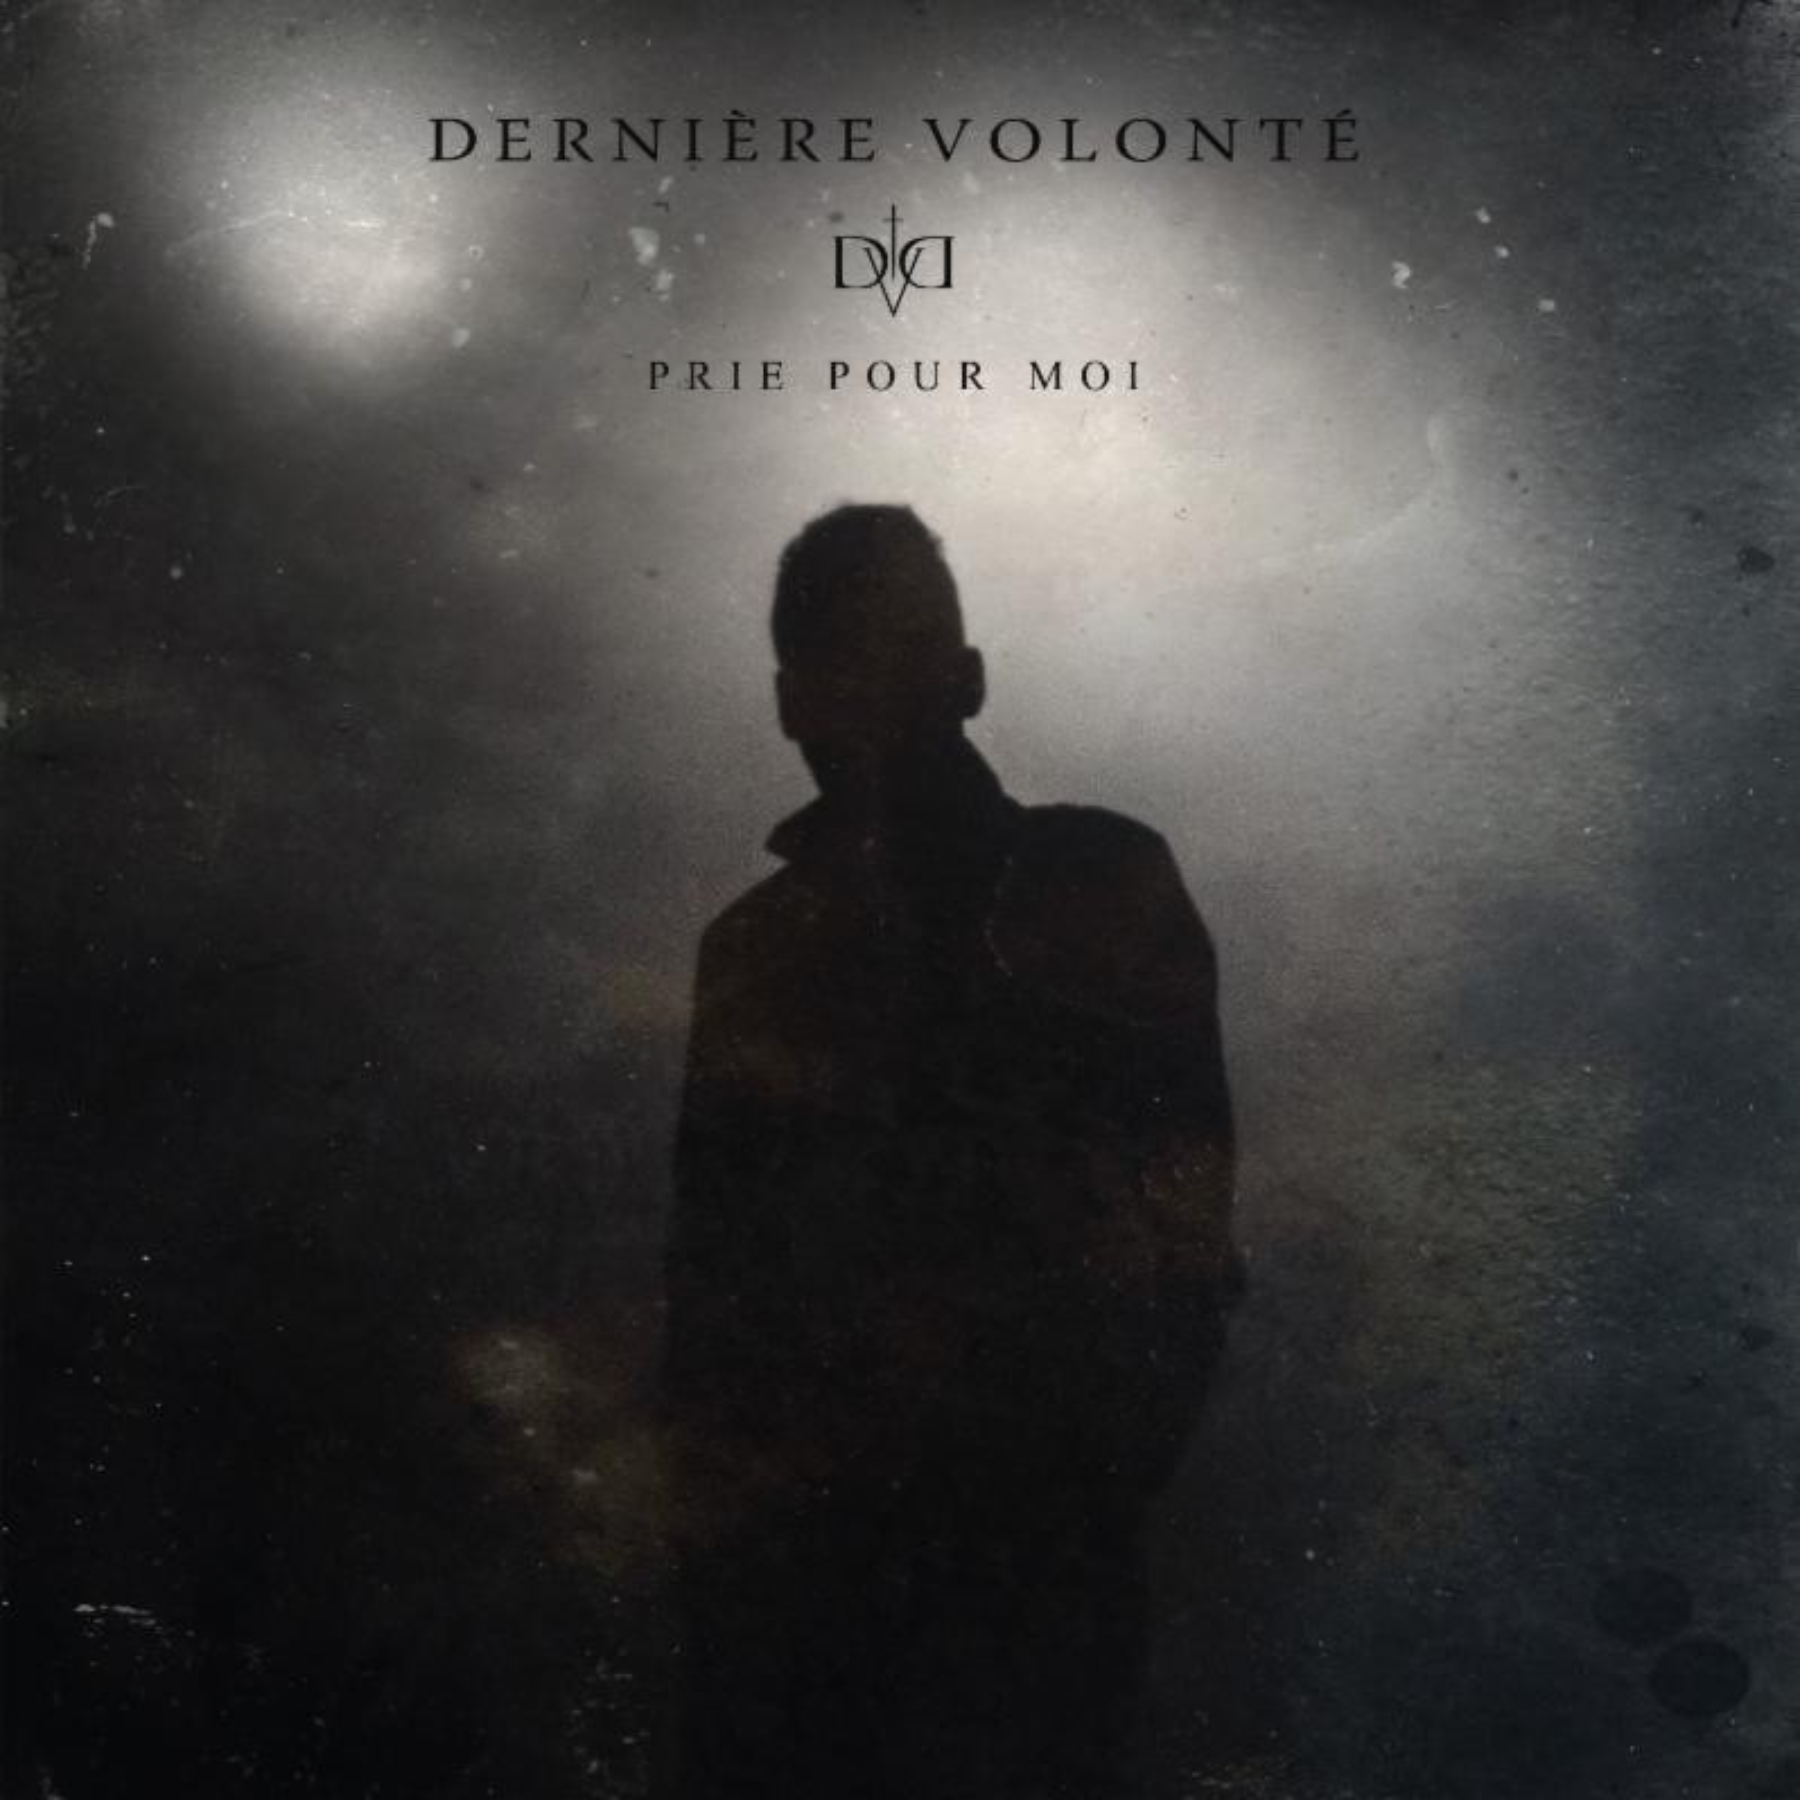 Derniere Volonte - Prie Pour Moi - CD